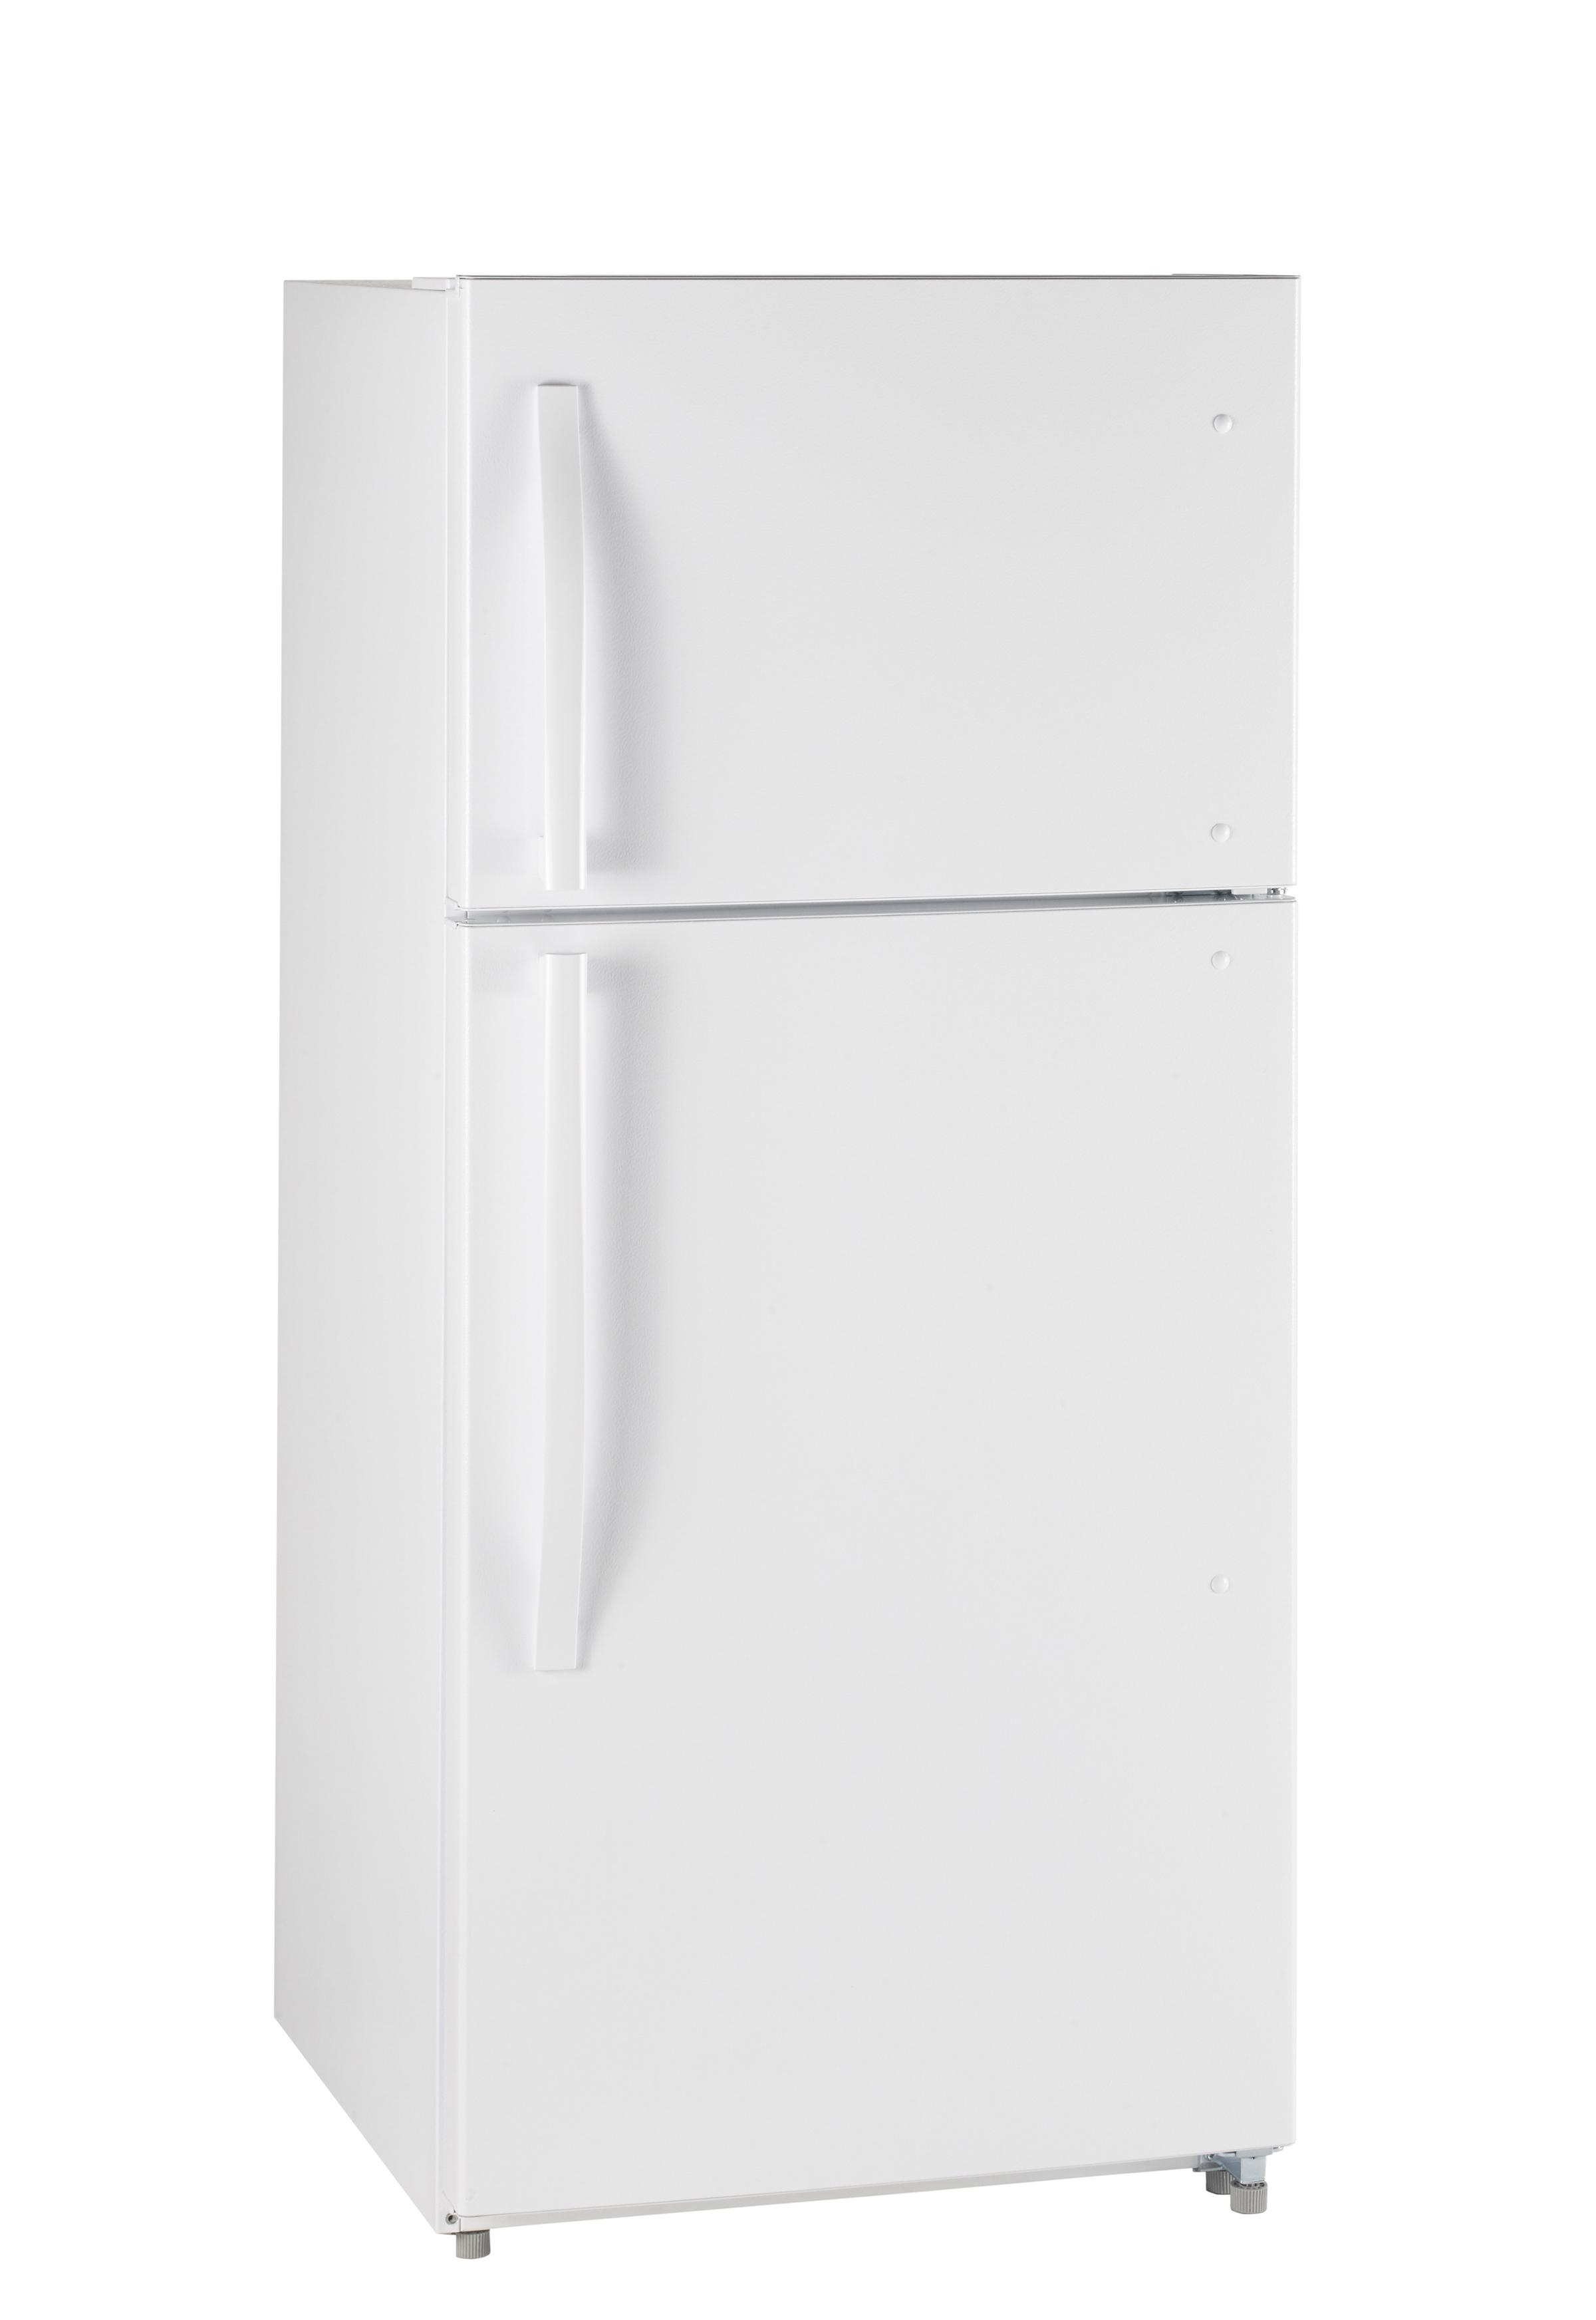 20872 – fridge – MTE18GTKWW – angled